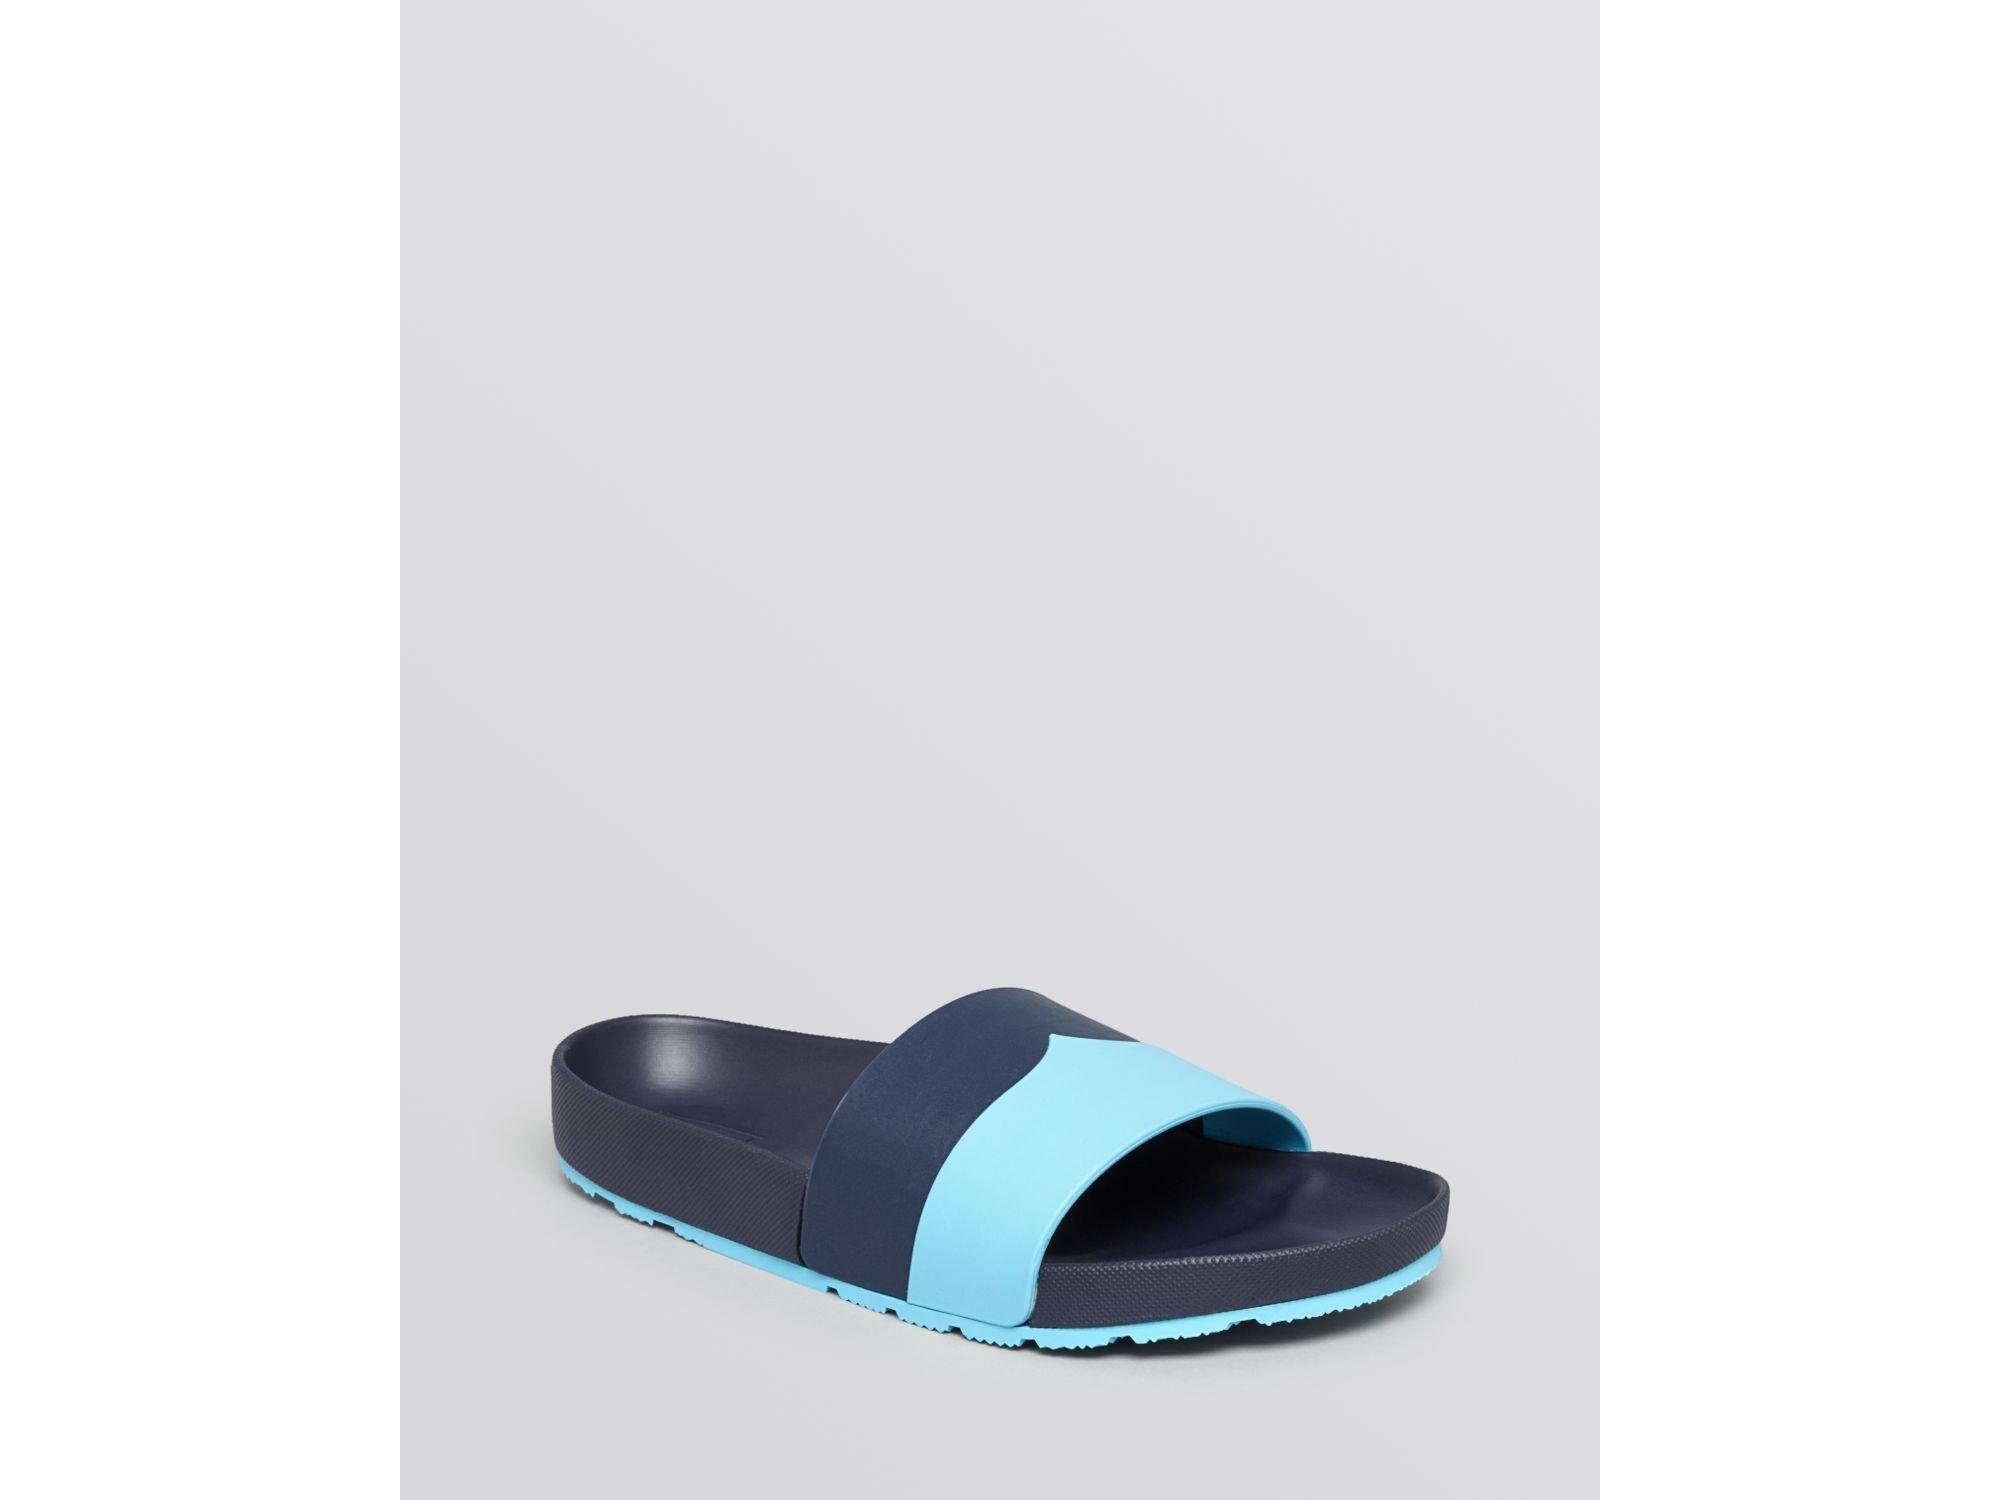 b6ca73764f9c Lyst - Hunter Open Toe Slide Sandals - Moustache Contrast in Blue